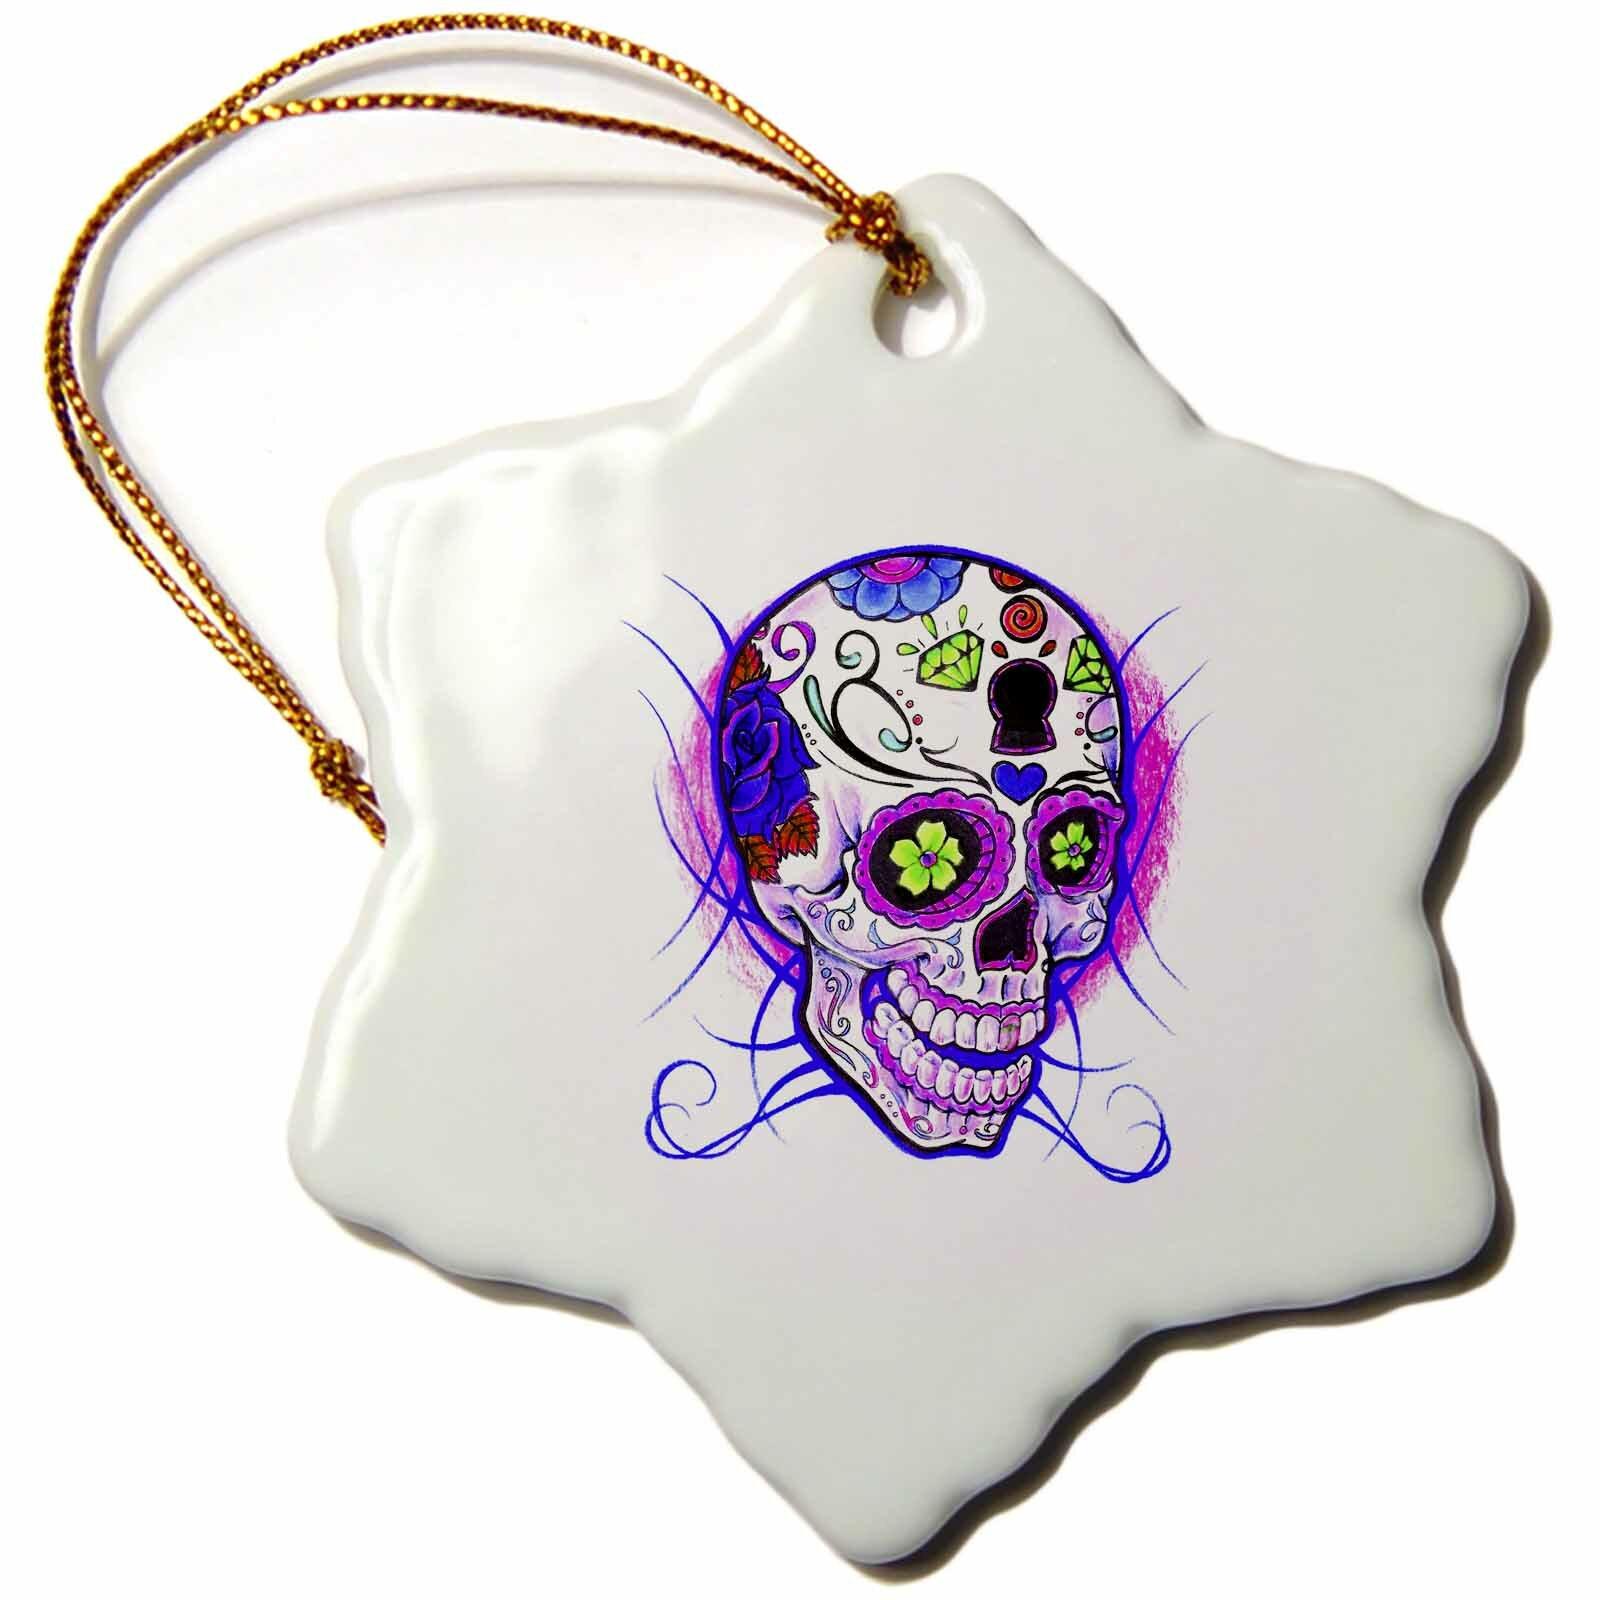 The Holiday Aisle Diamond Sugar Skull Snowflake Holiday Shaped Ornament Wayfair